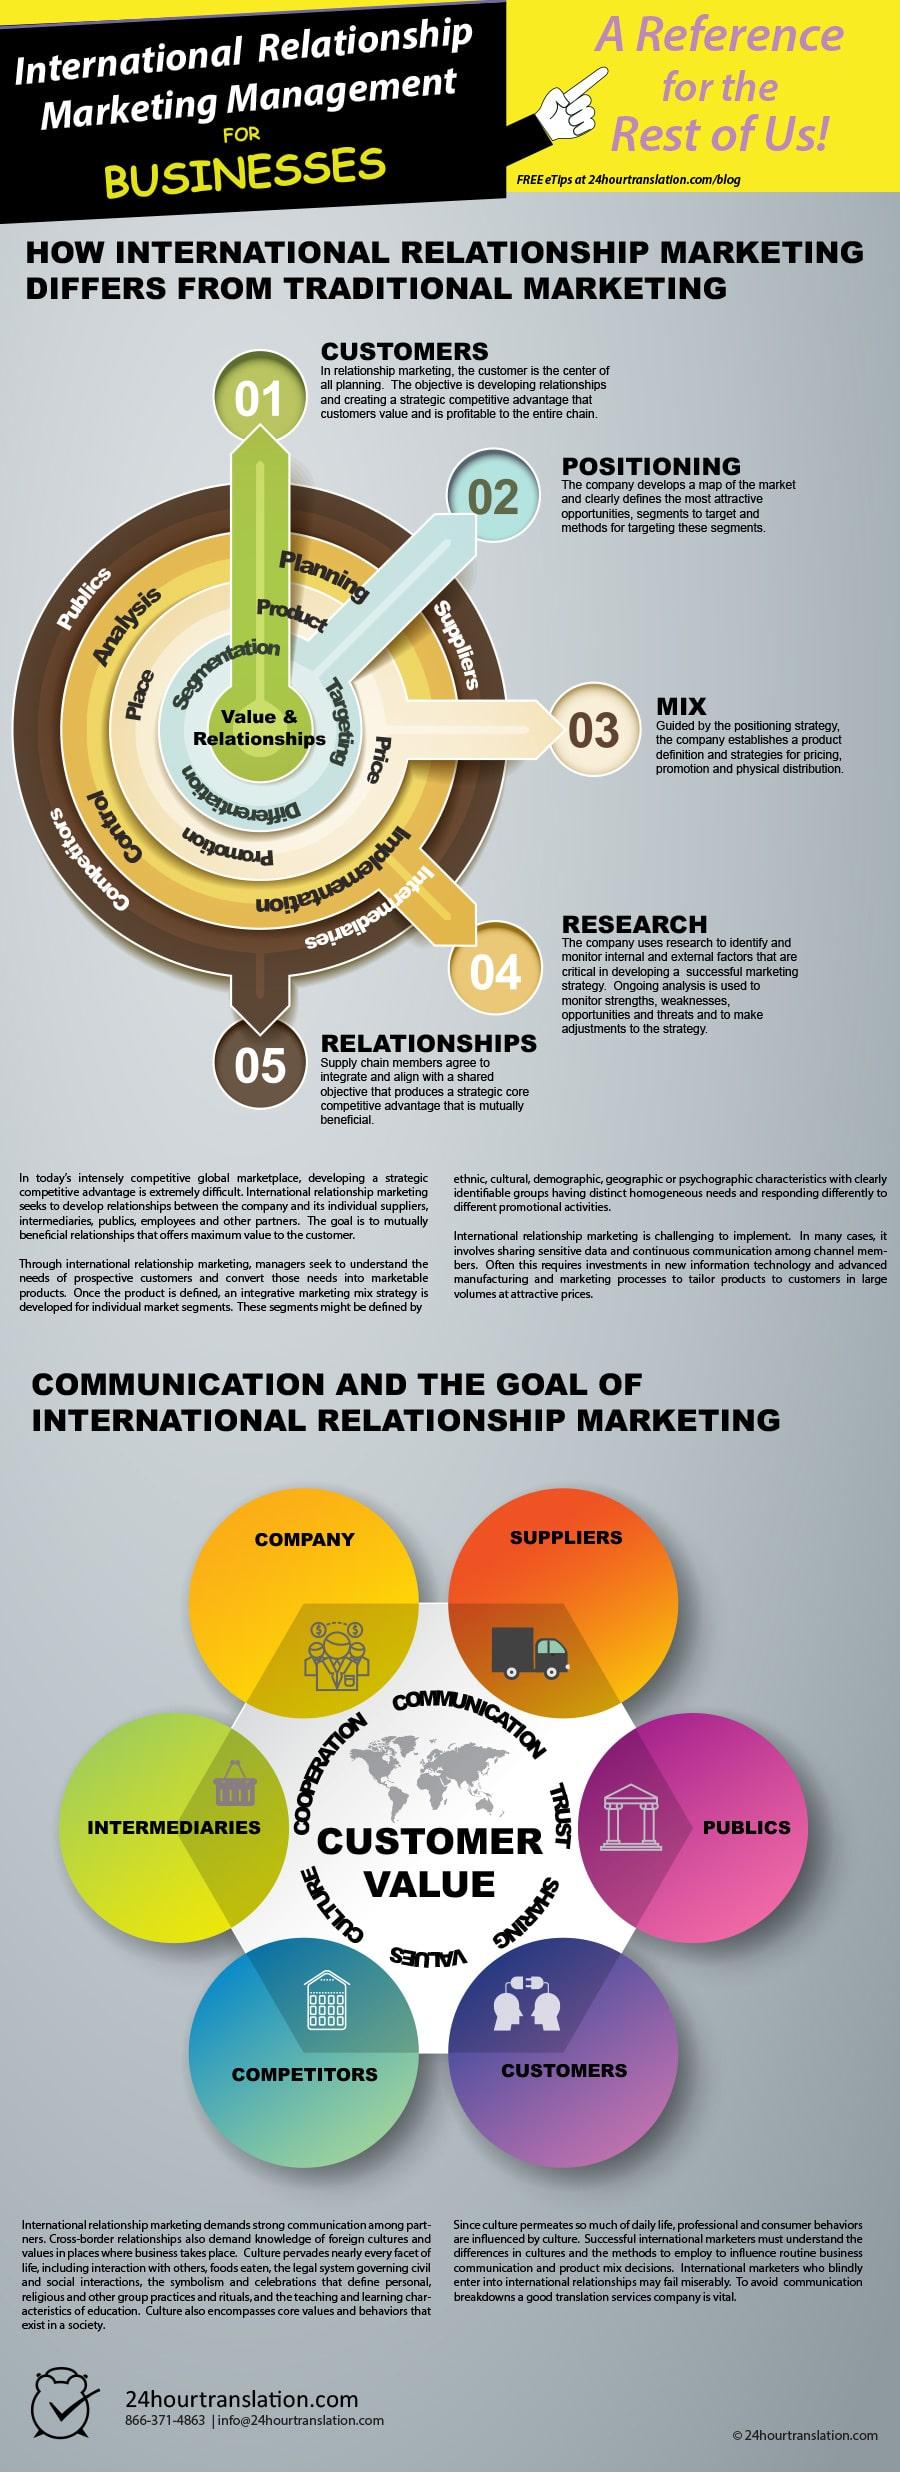 International Relationship Marketing